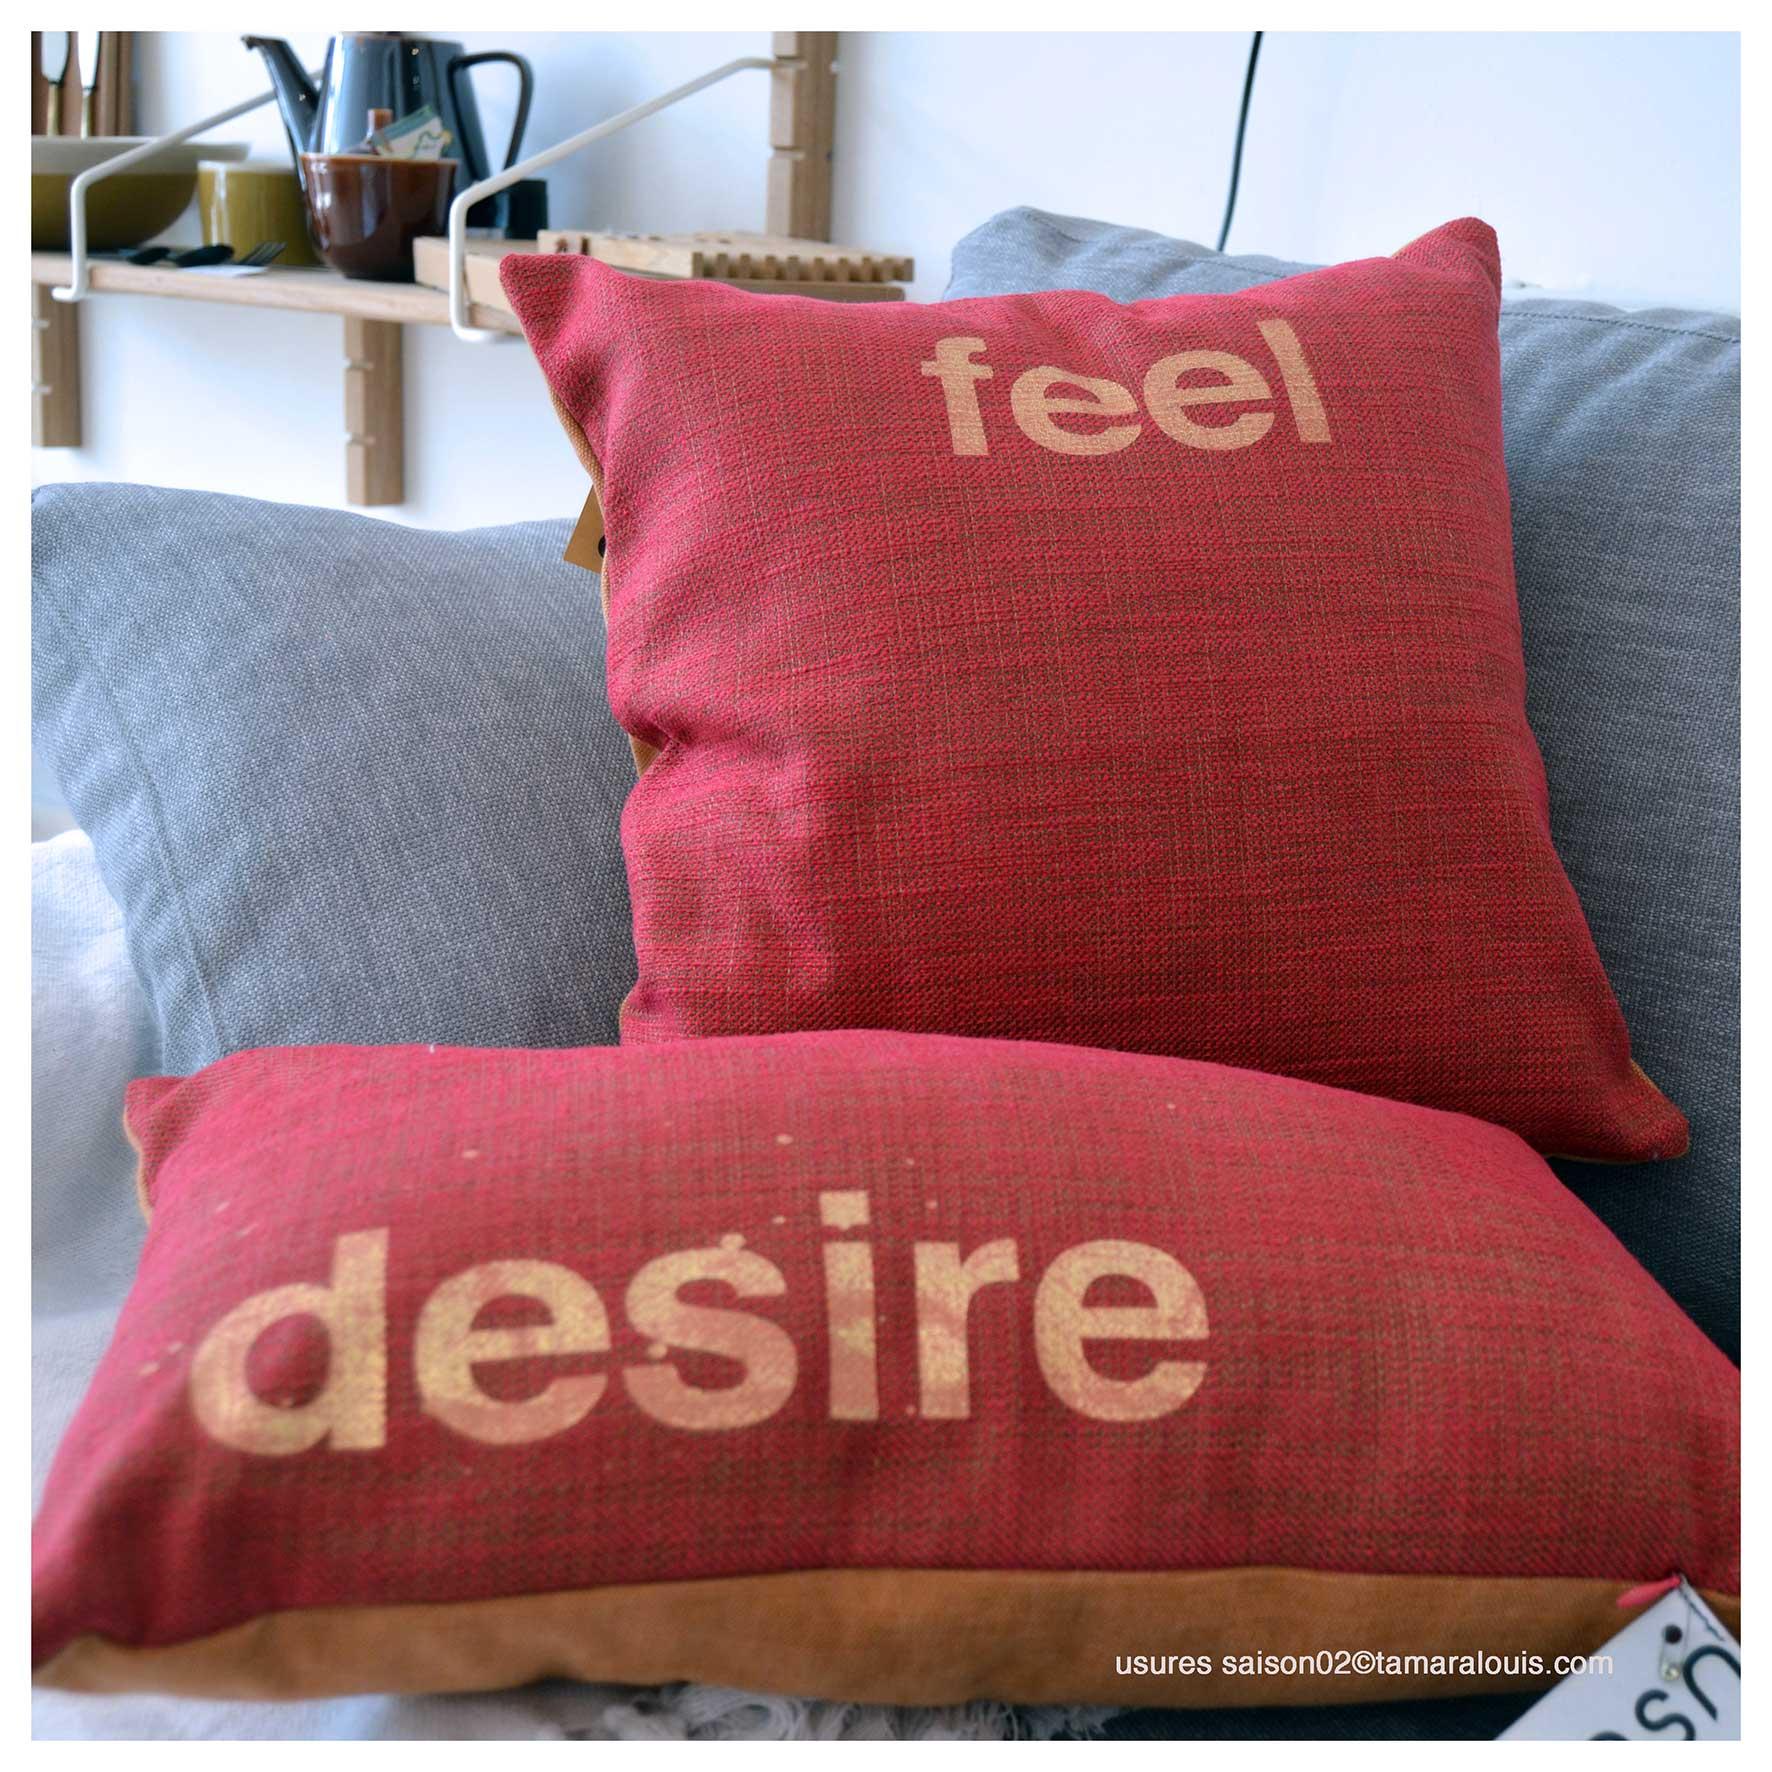 slowdesign & ameublement design textile